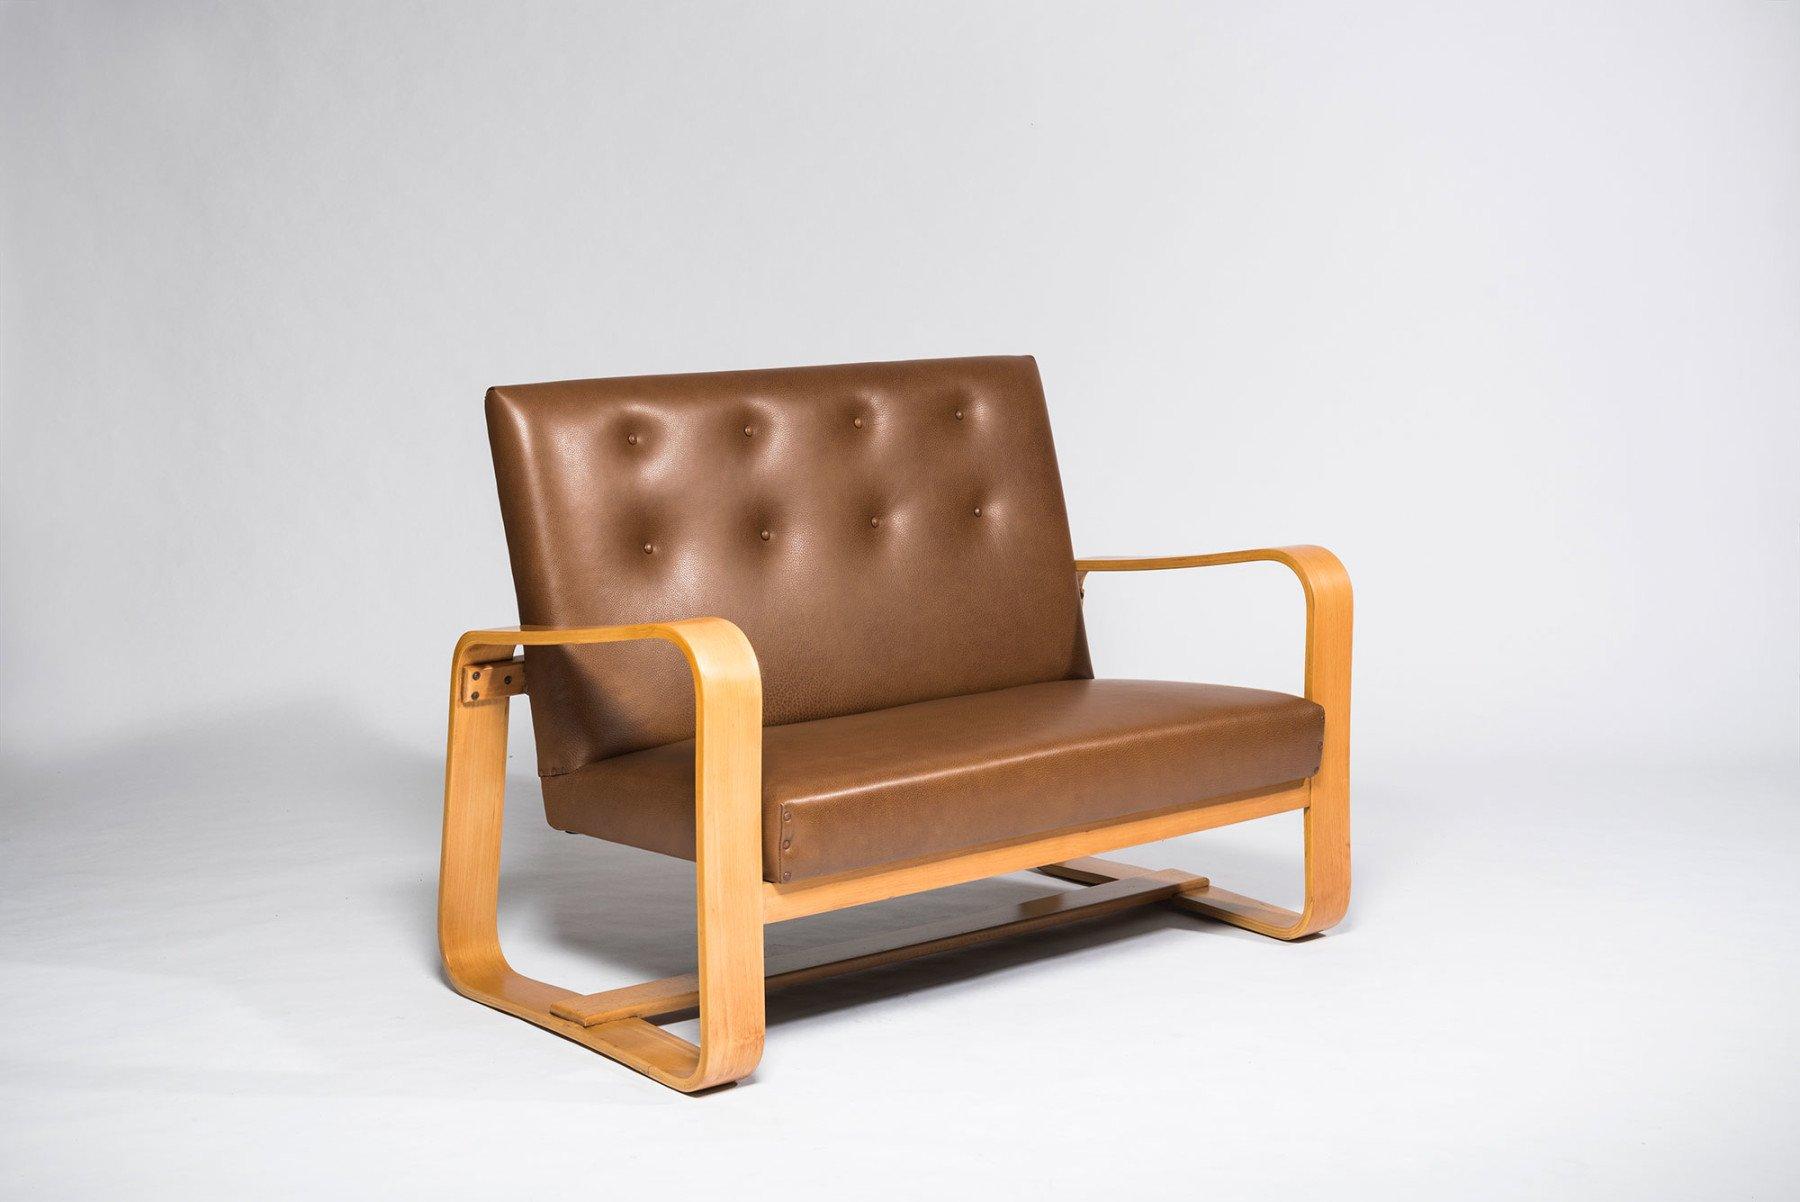 Giuseppe Pagano Pogatschnig |   Sofa